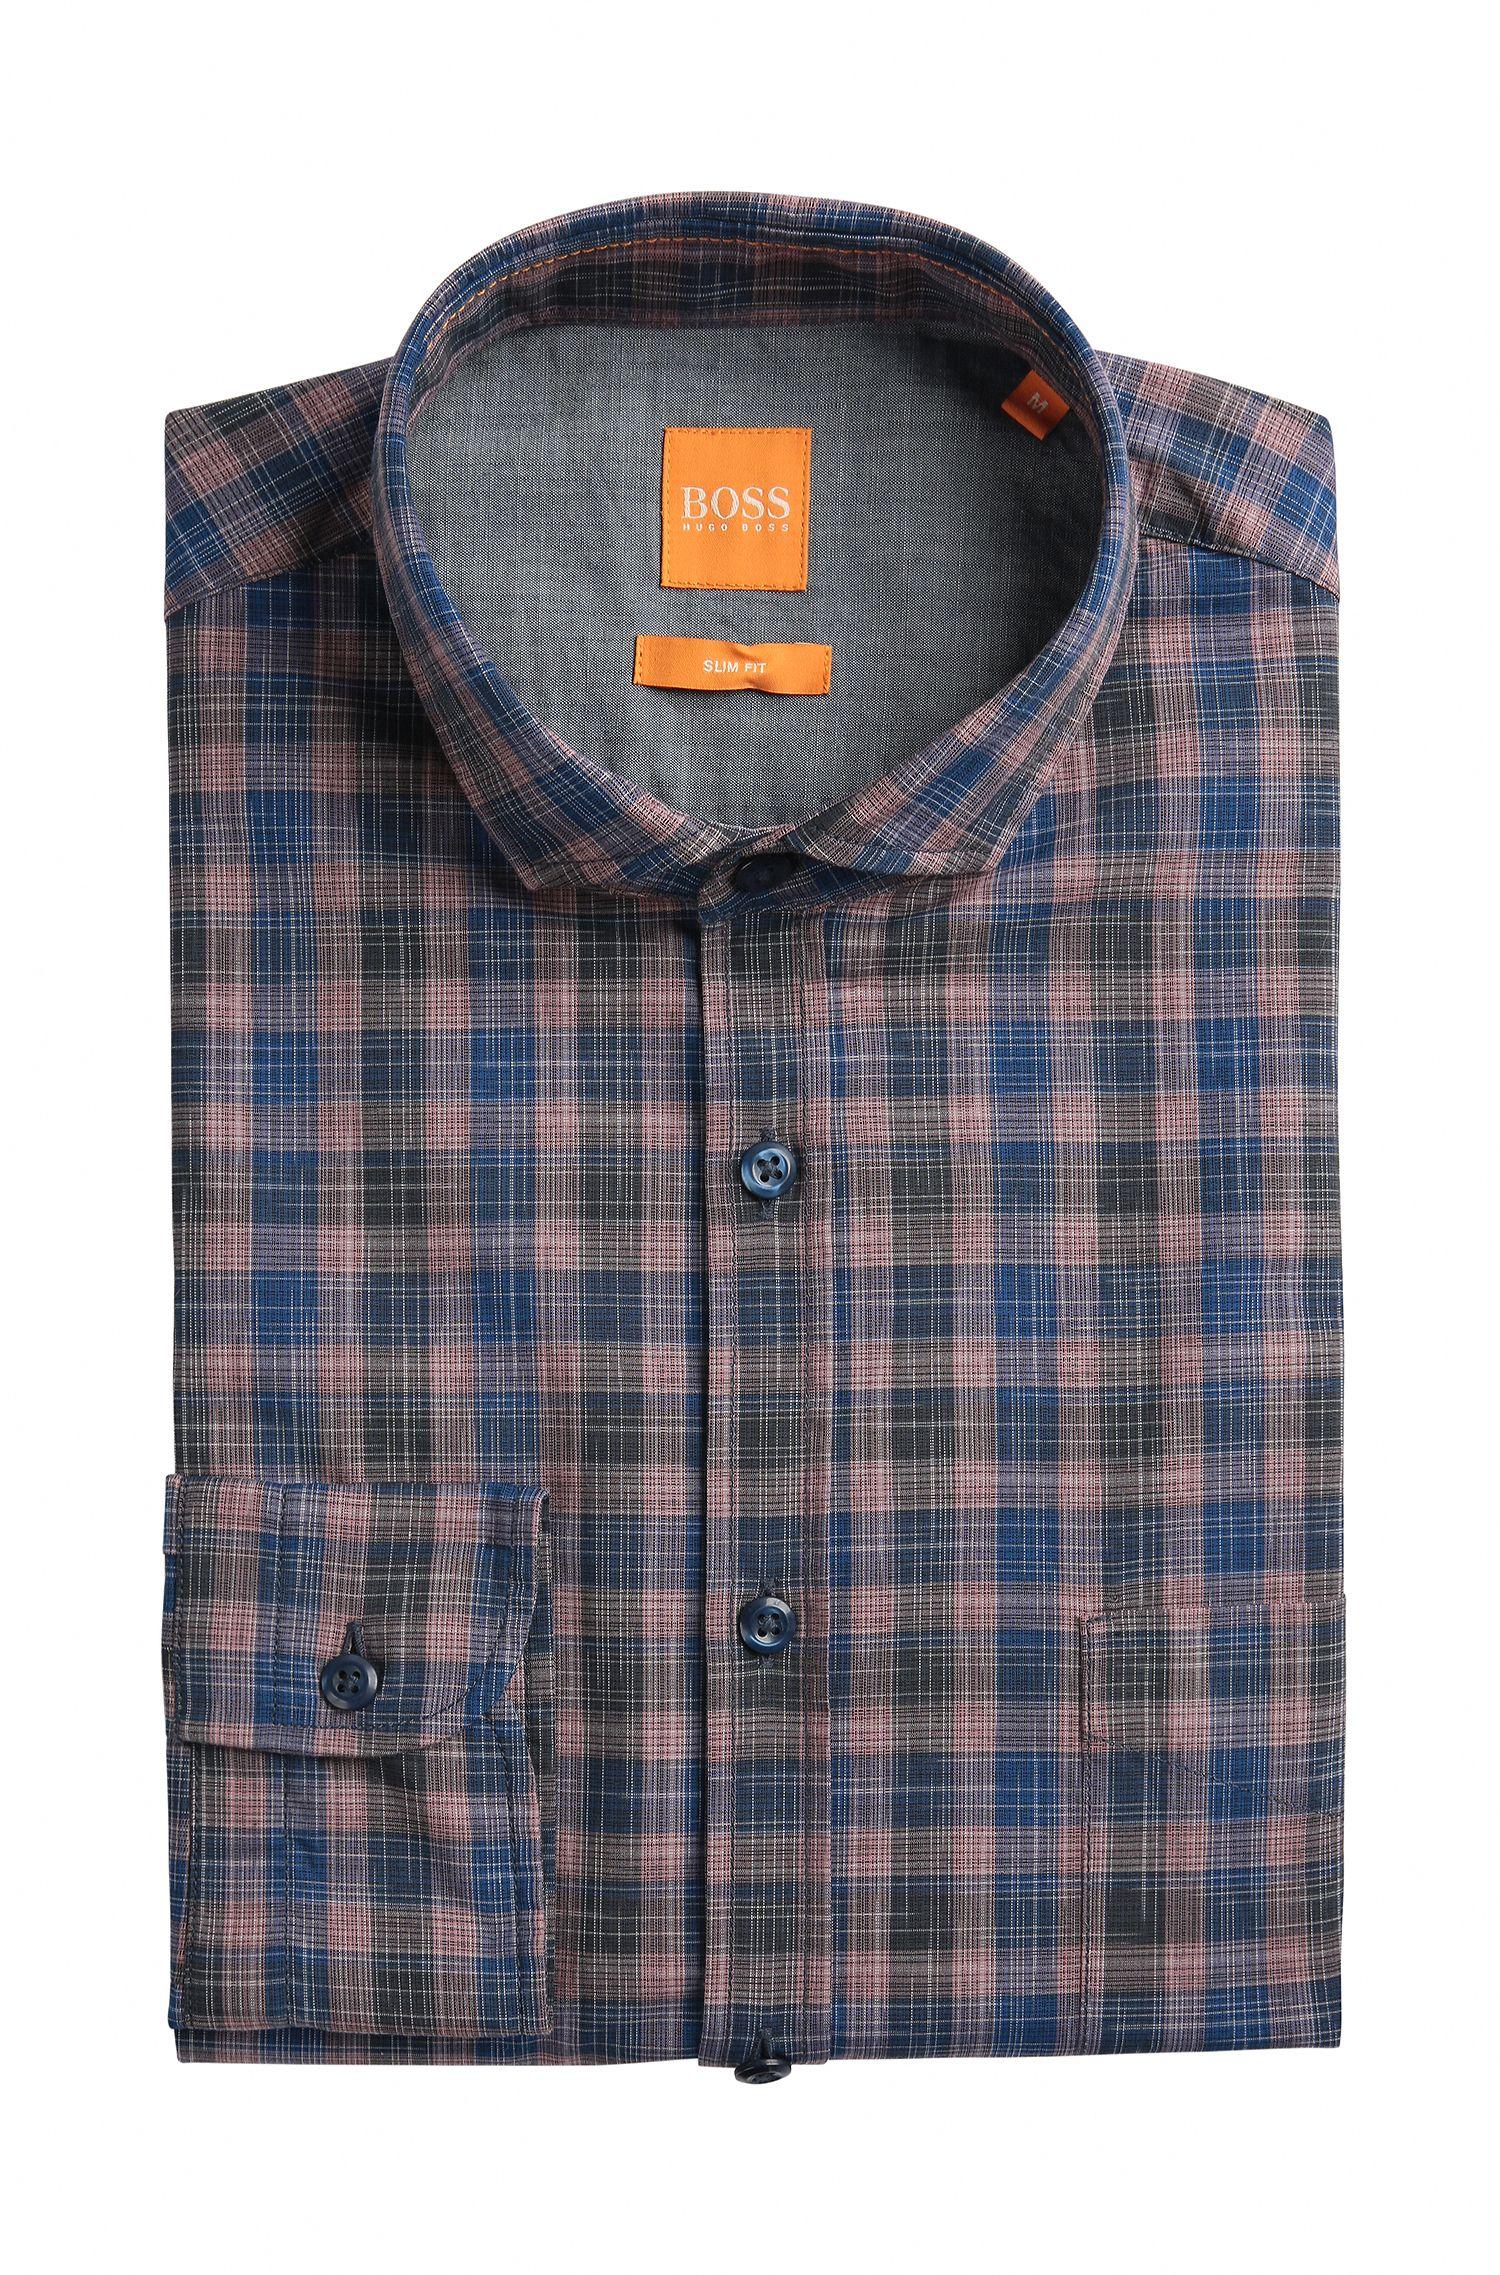 Plaid Cotton Sport Shirt, Slim Fit | Cattitude, Dark Blue